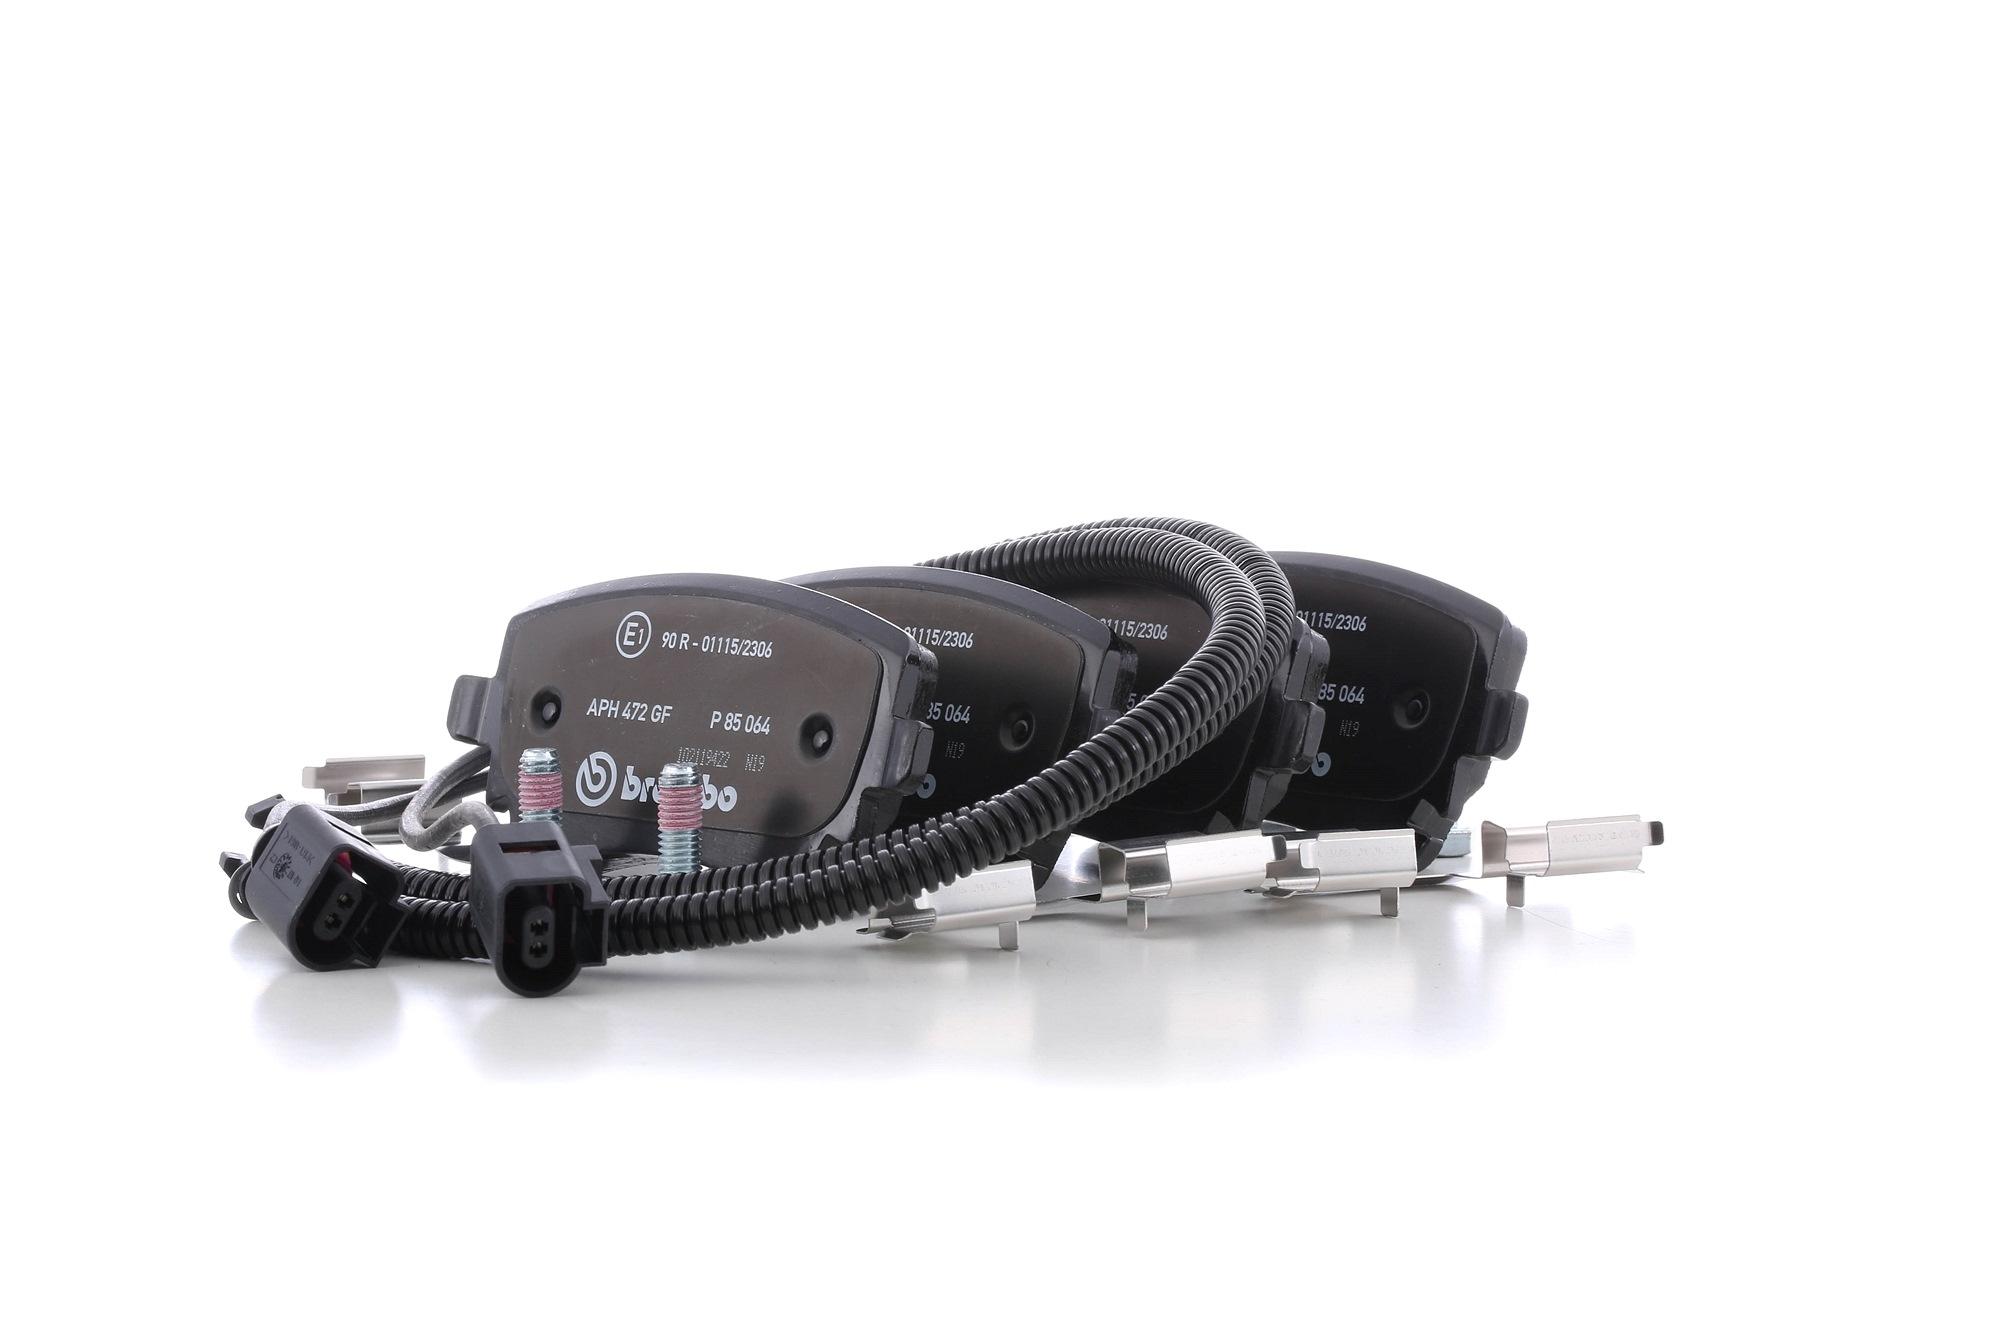 Bremsbelagsatz BREMBO D10187921 Bewertung